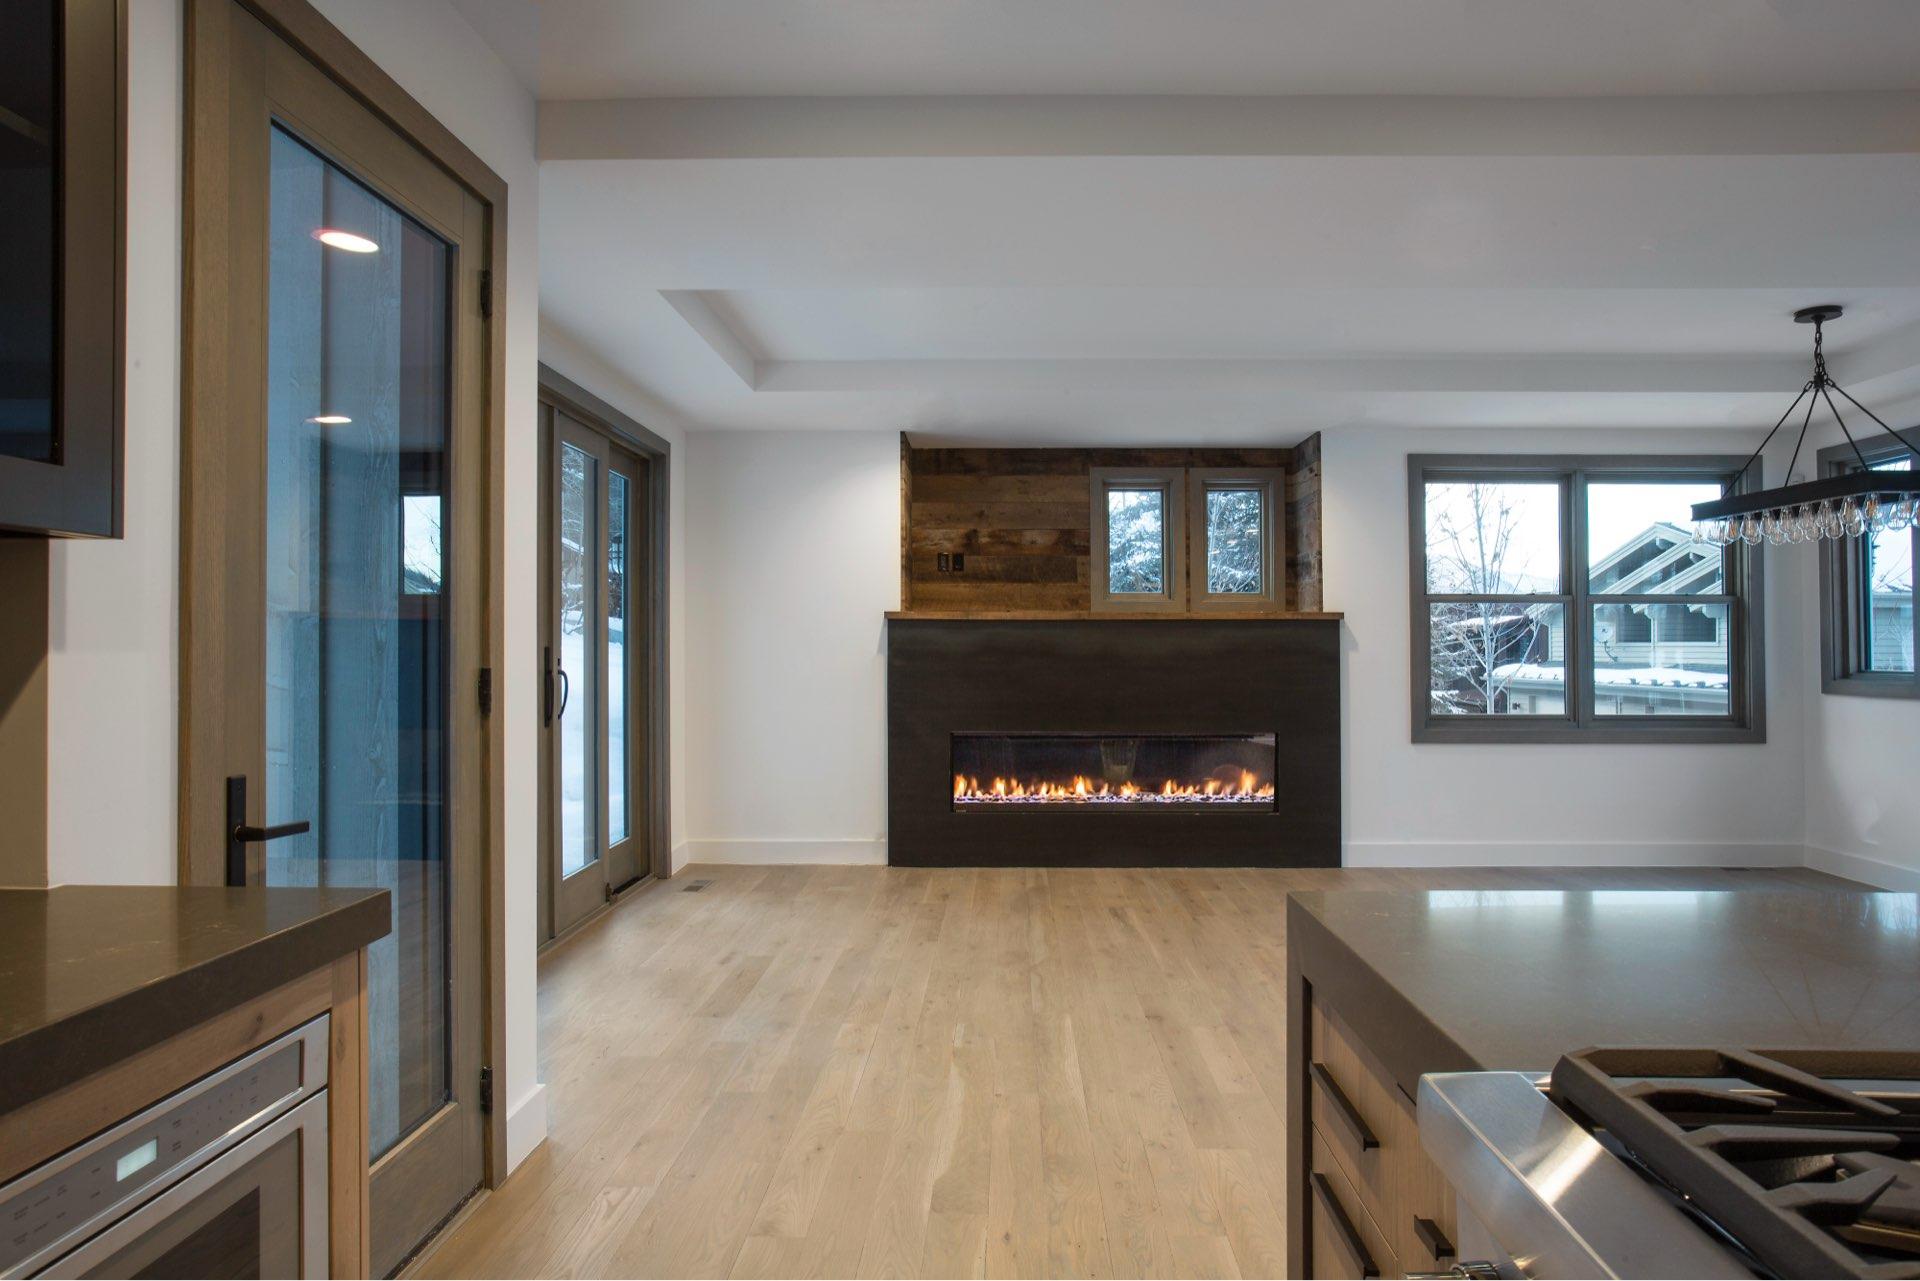 Interior design, Lilac Hill Duplex - Historic, architectural design and historic restoration by Elliott Workgroup